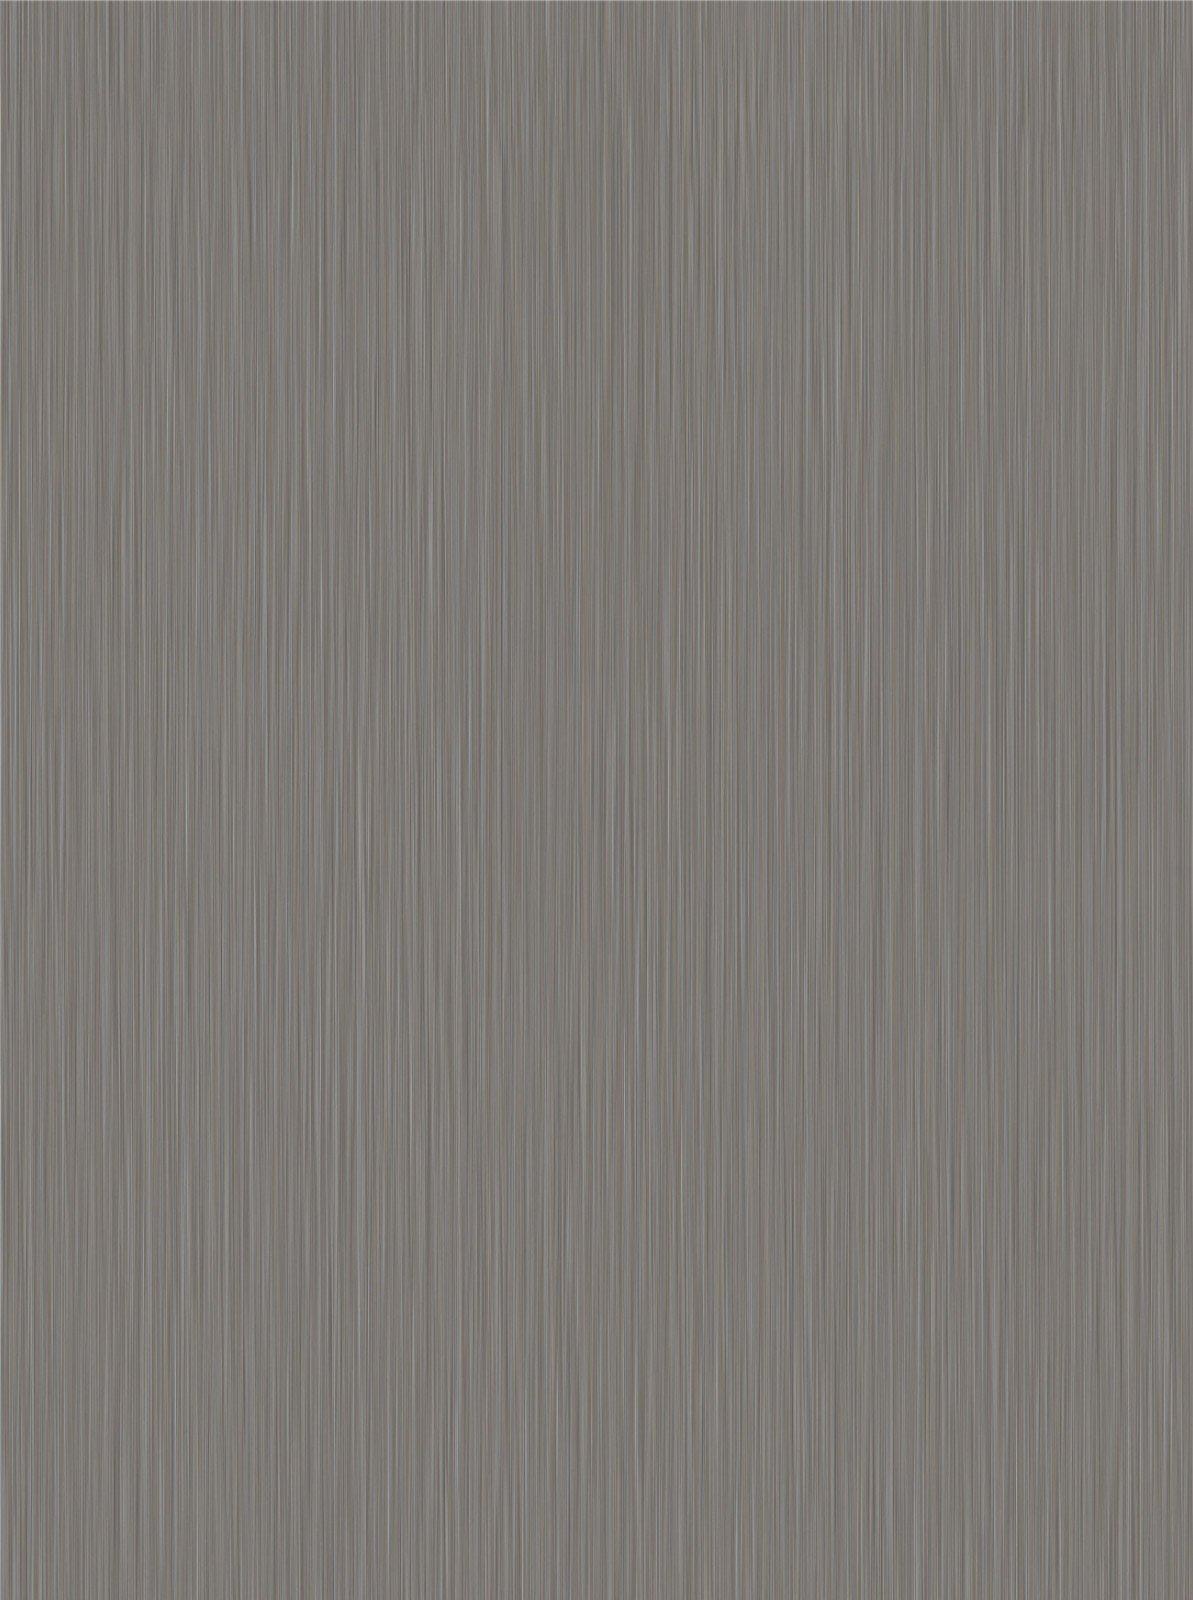 78138 780281 feet 78146 I.DECOR Decorative Material decor paper